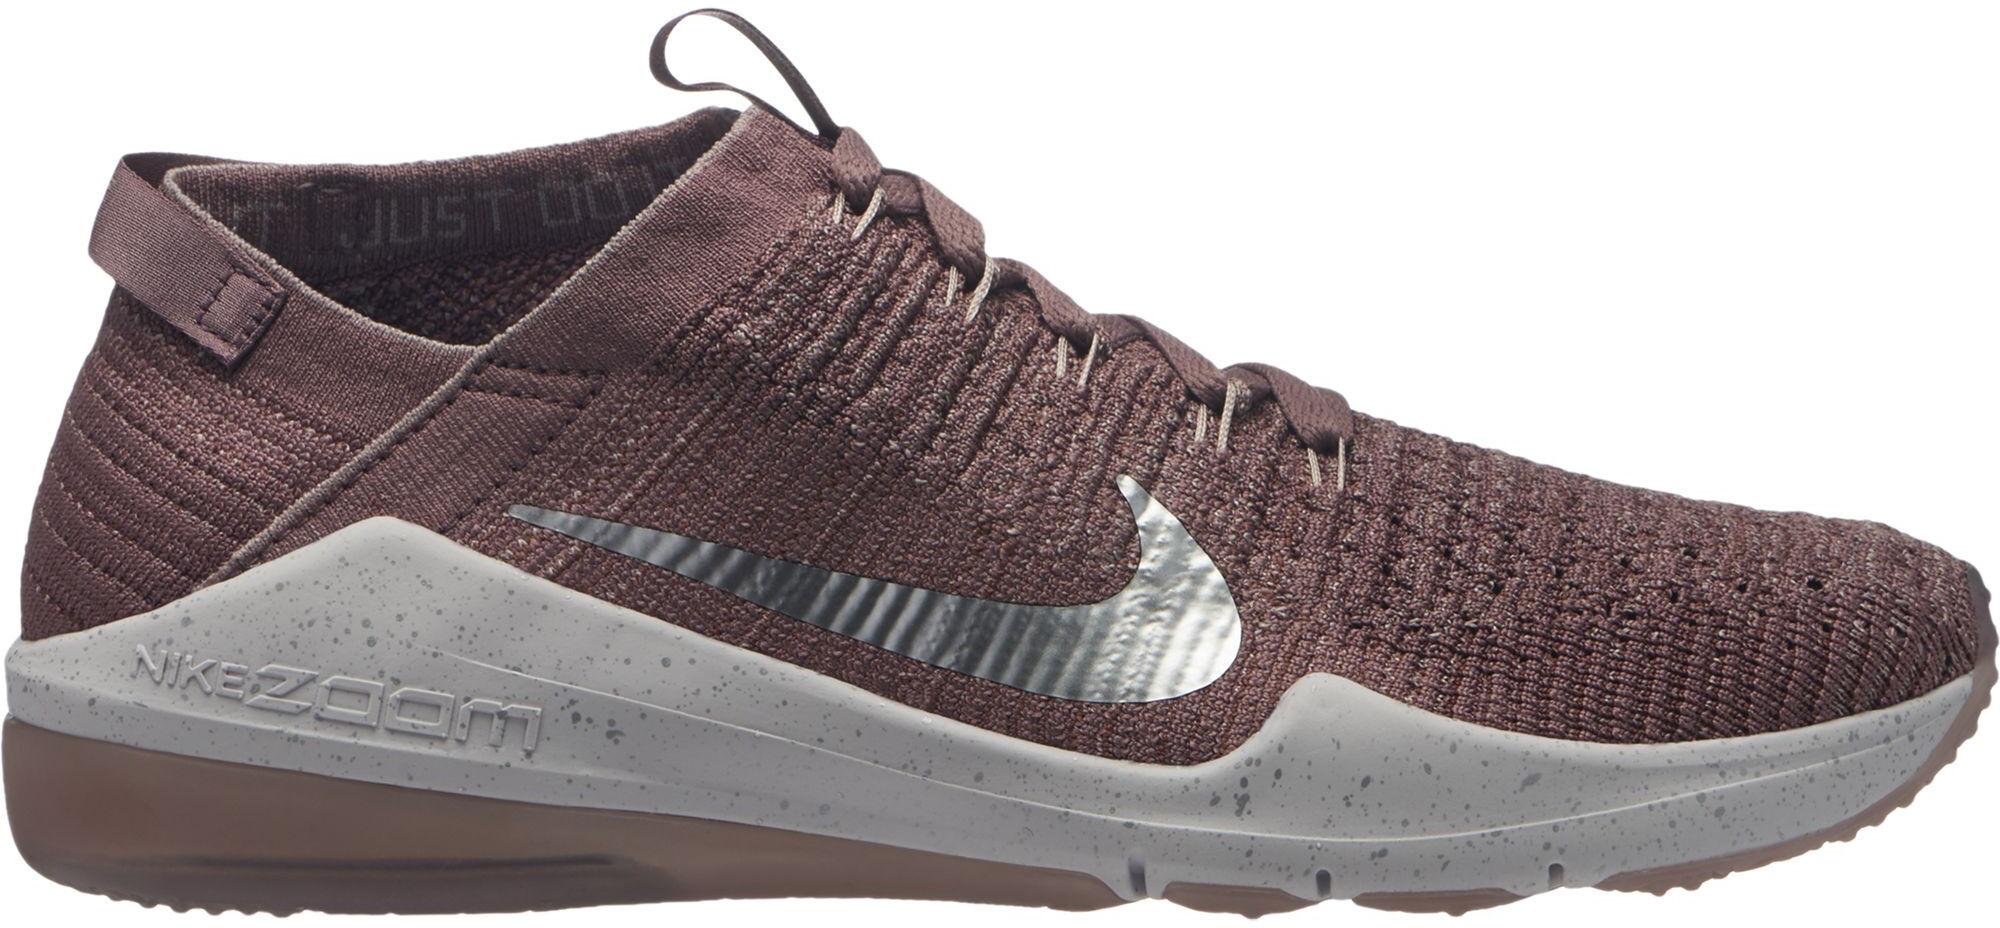 Running Mujer amp; Nike Zapatillas 14261b reed 8nxYBEw Intersport U8nxrU